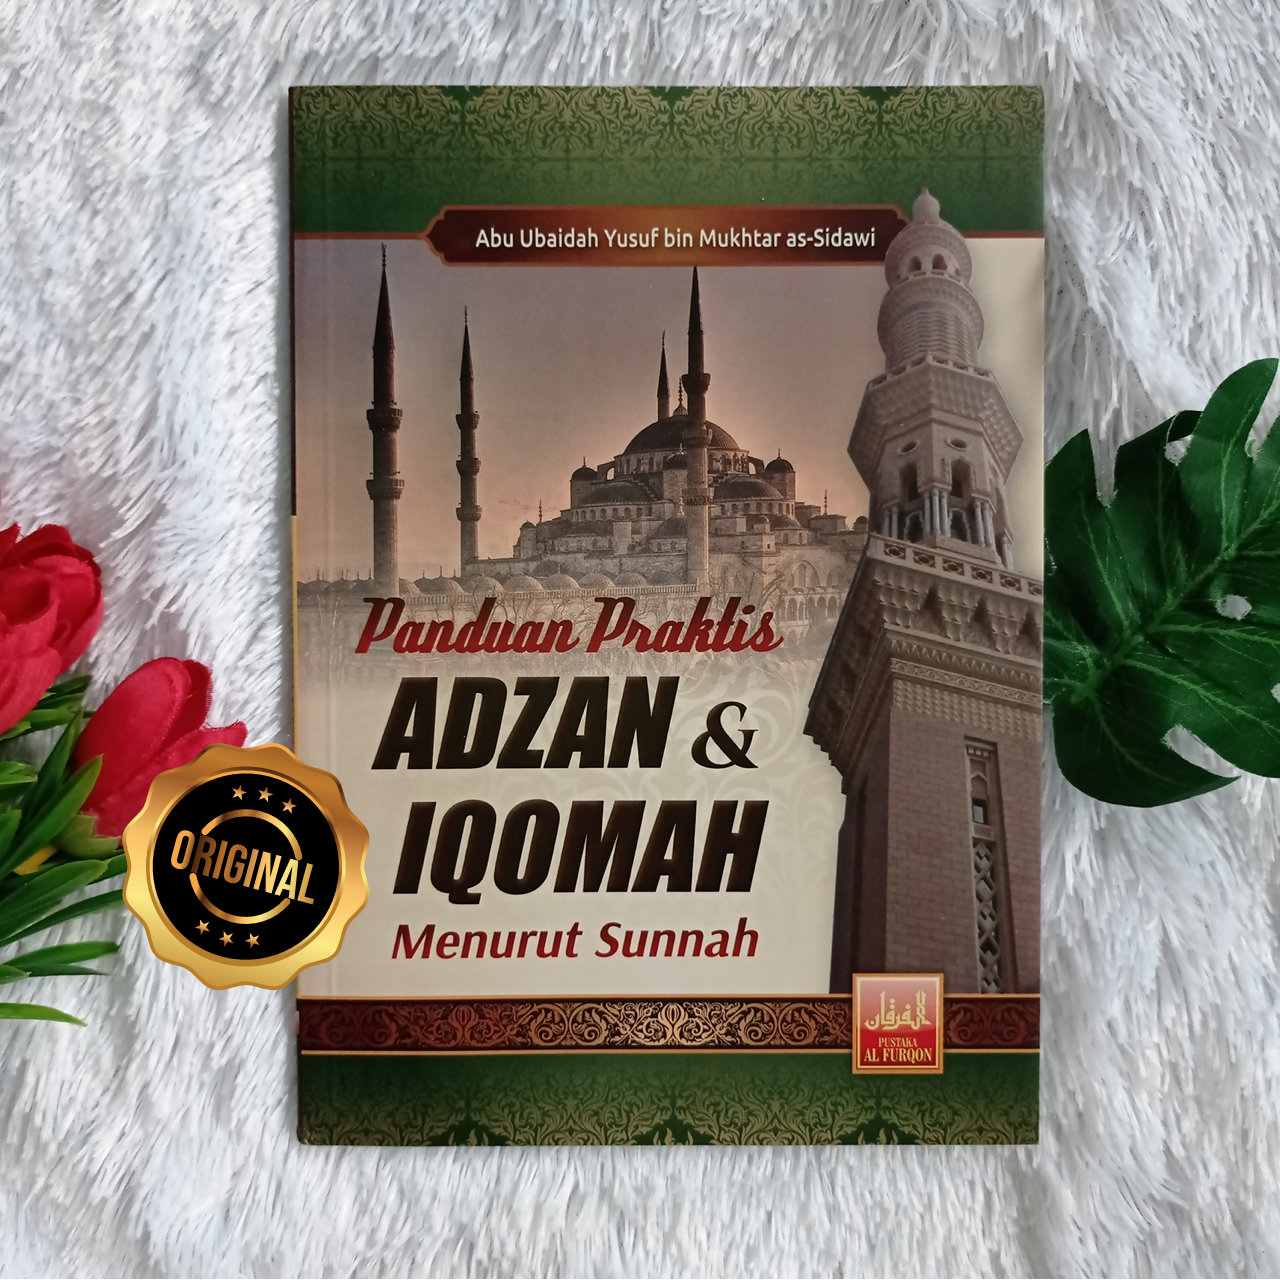 Buku Panduan Praktis Adzan Dan Iqomah